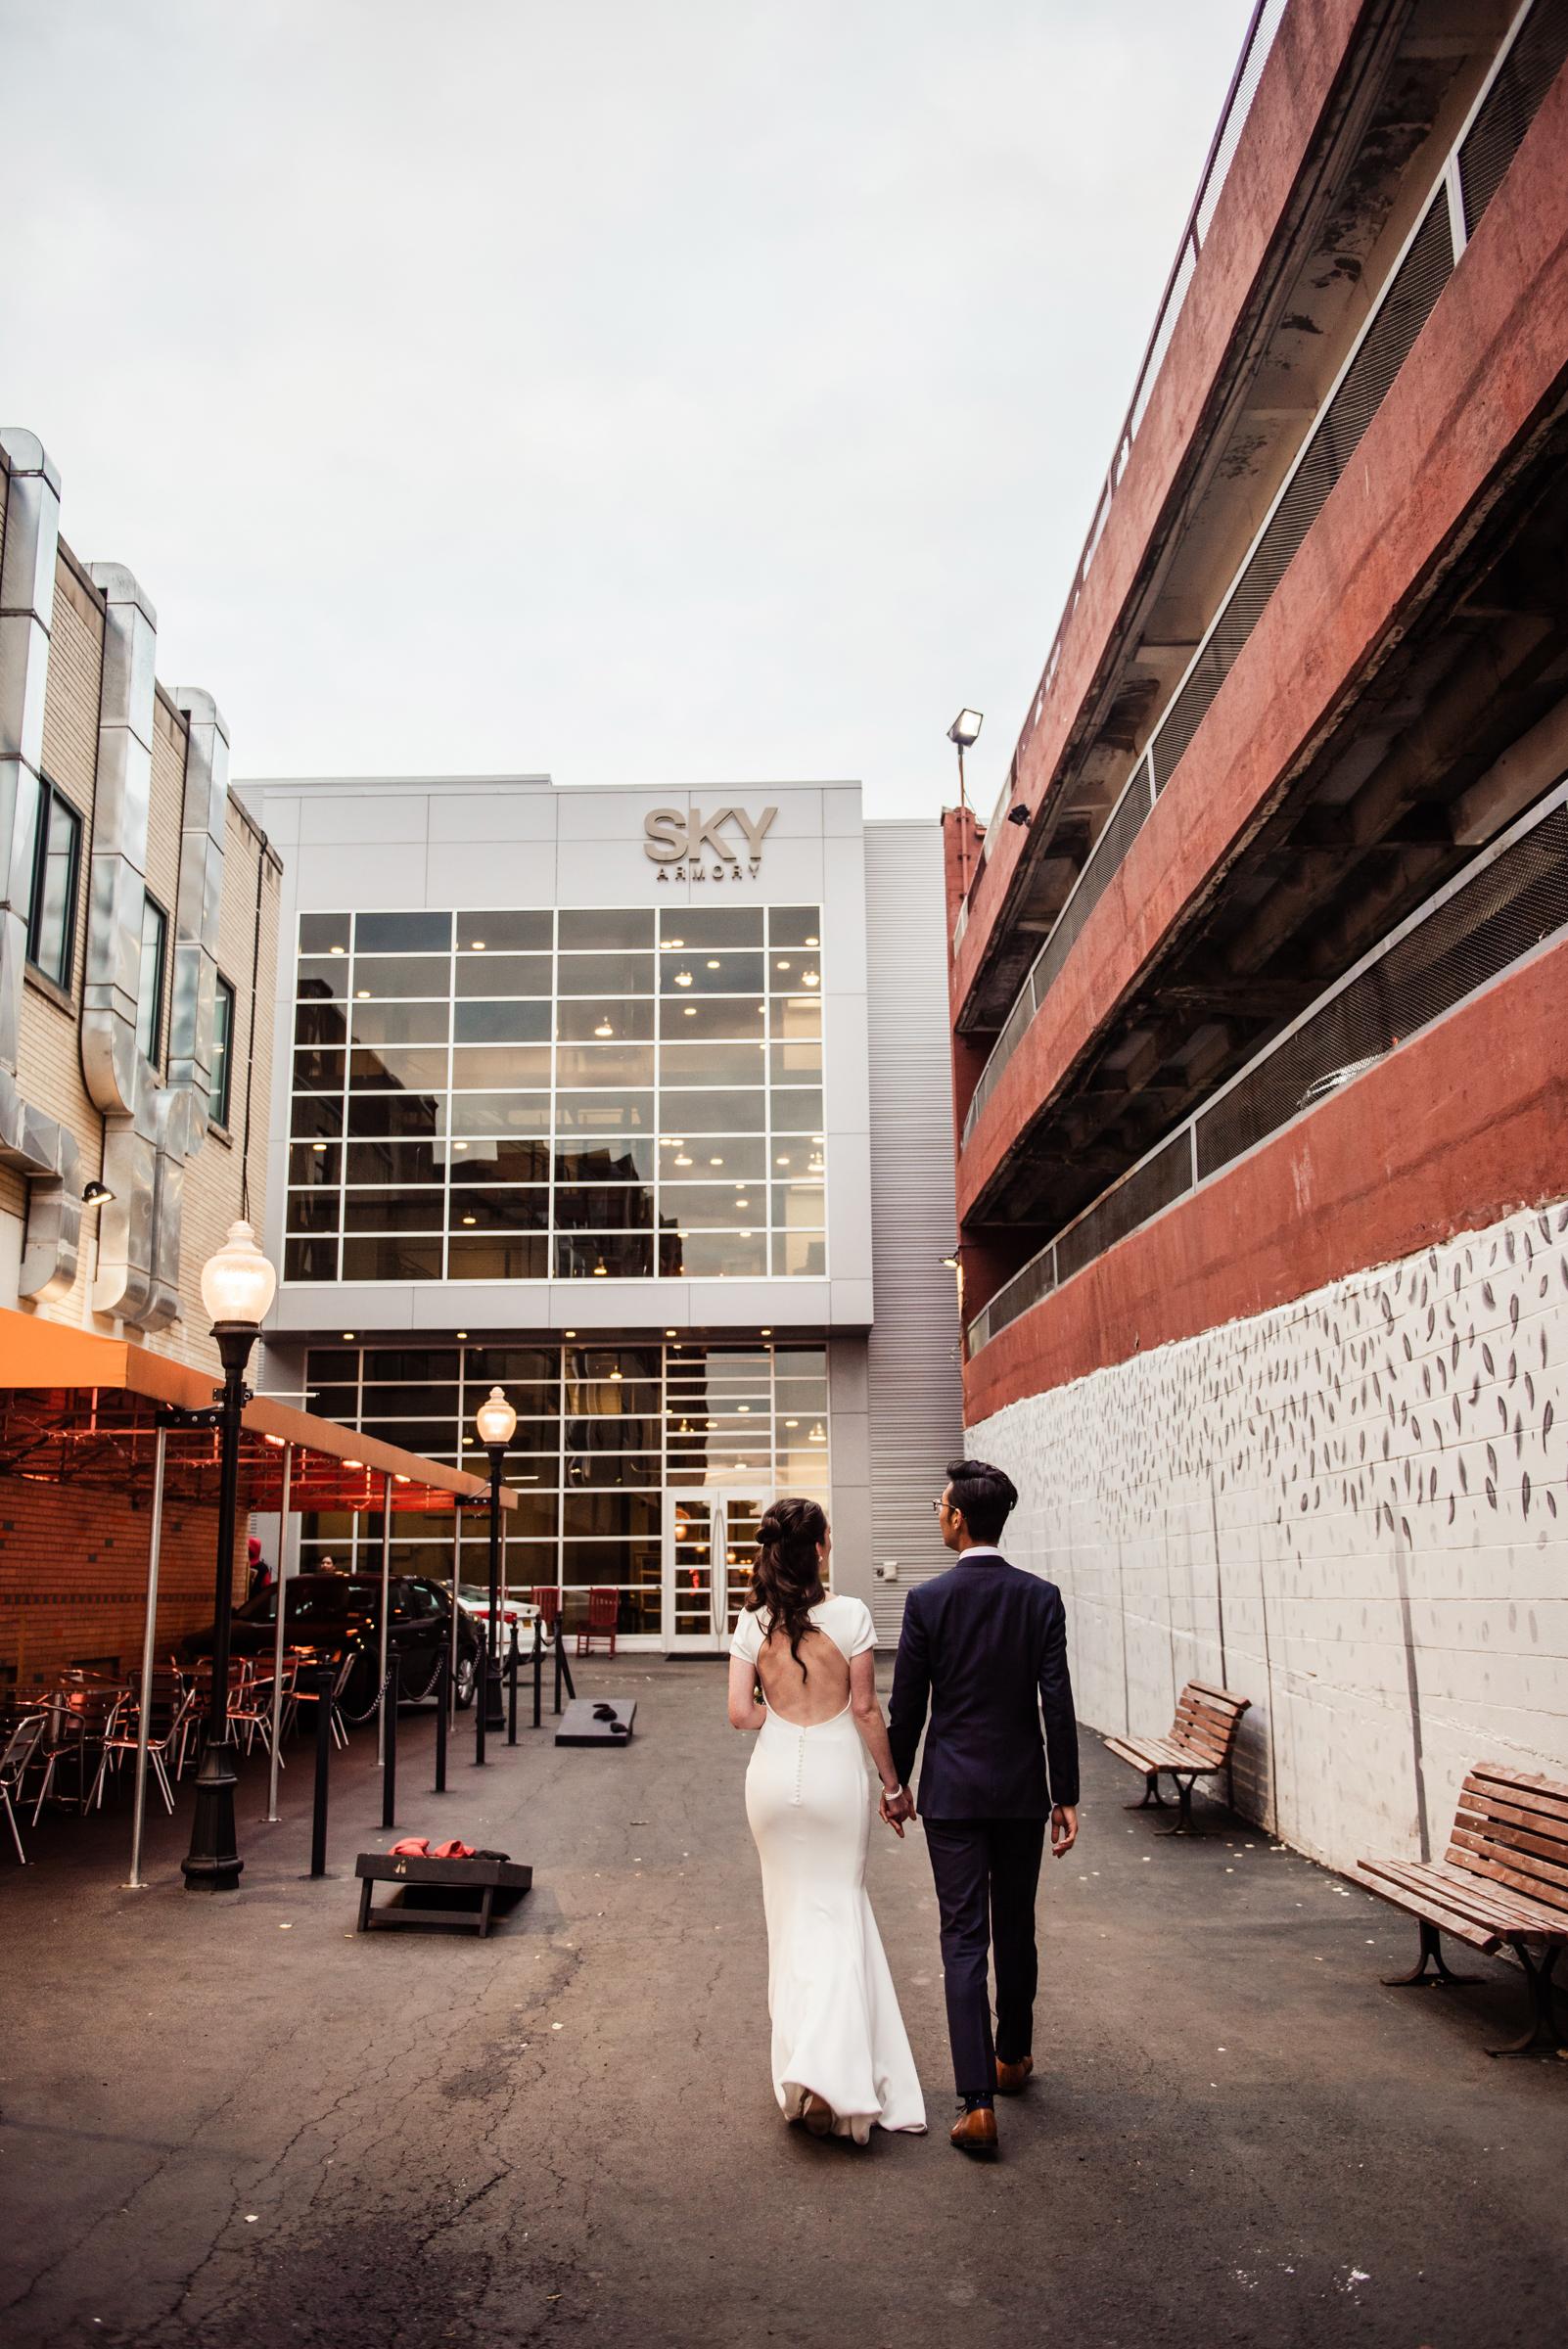 SKY_Armory_Syracuse_Wedding_JILL_STUDIO_Rochester_NY_Photographer_DSC_6228.jpg